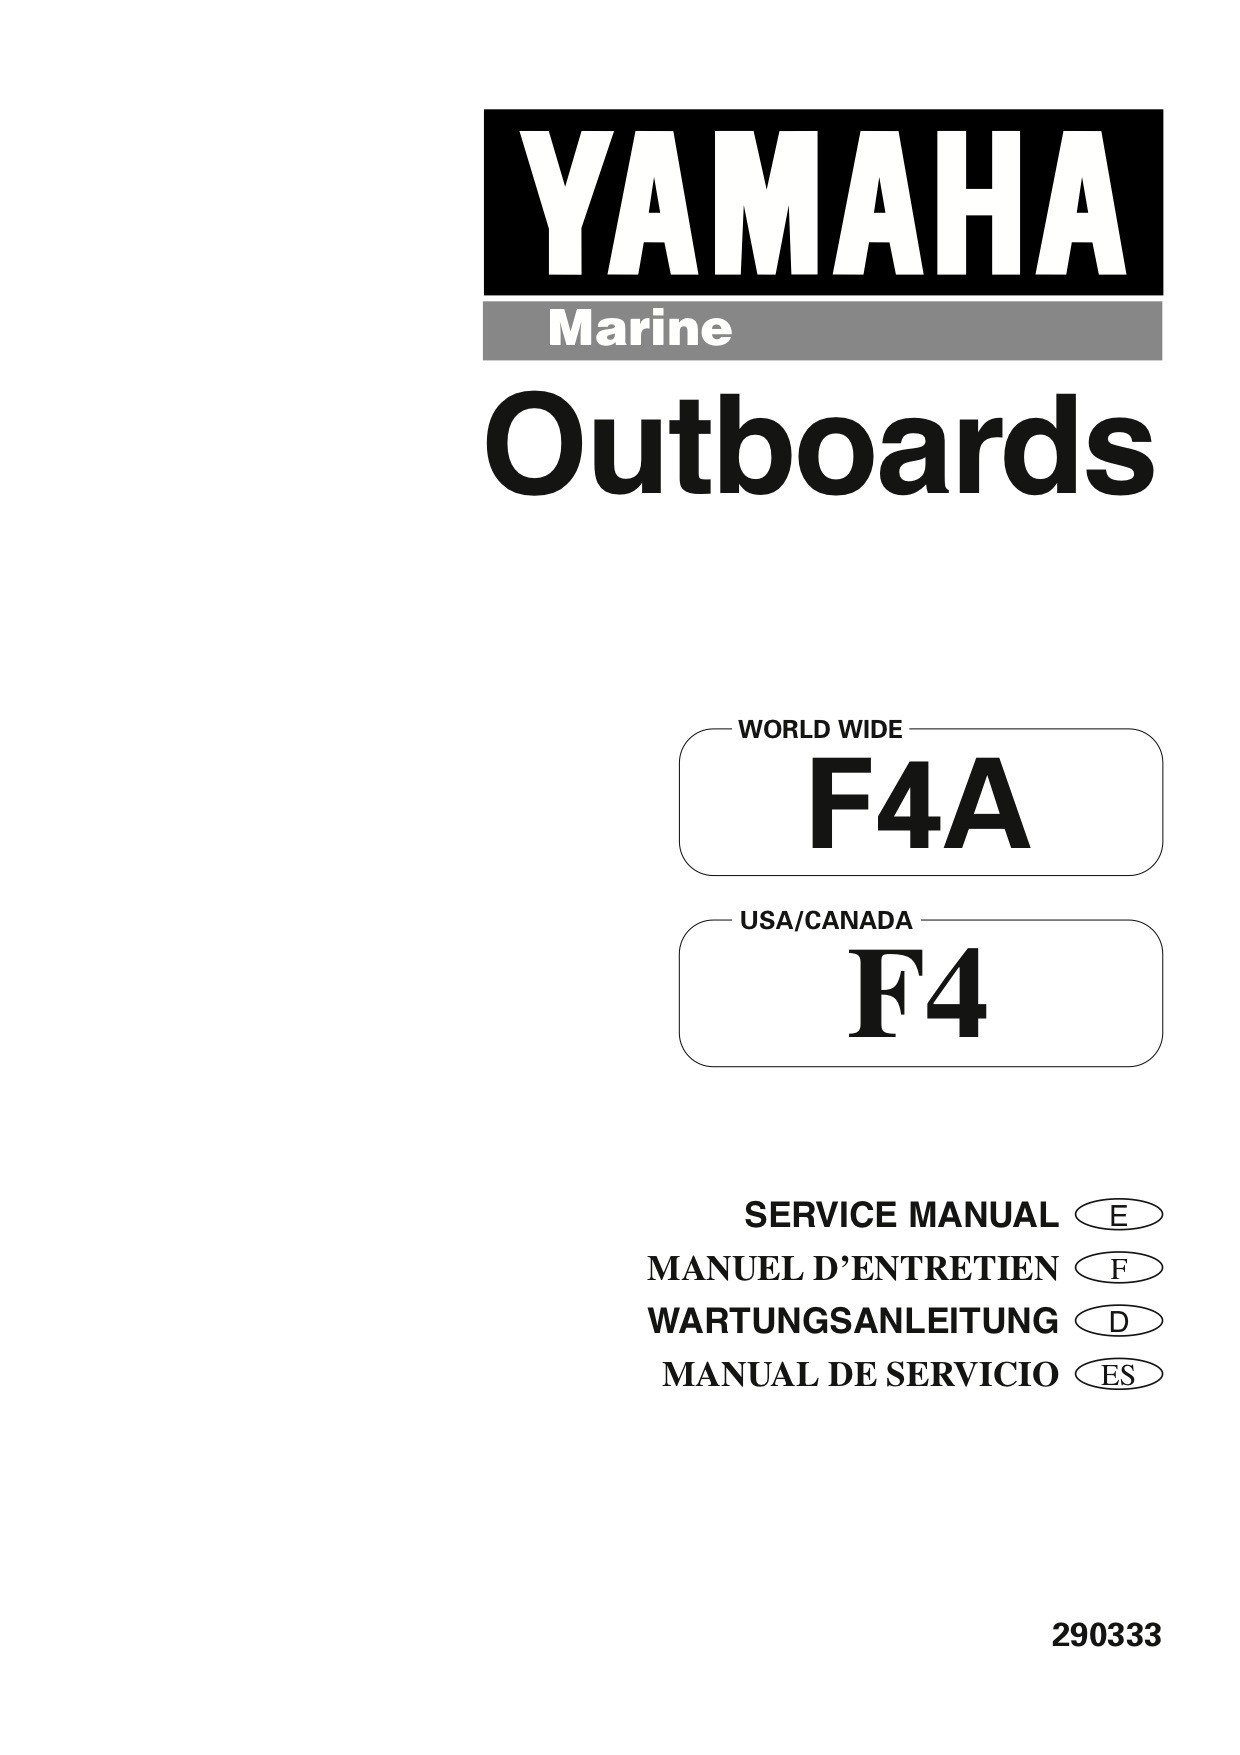 Yamaha F20 Manual Iveco Daily Diagram Repair Manuals Wiring Diagrams Array 4 Stroke Engine Rh Com